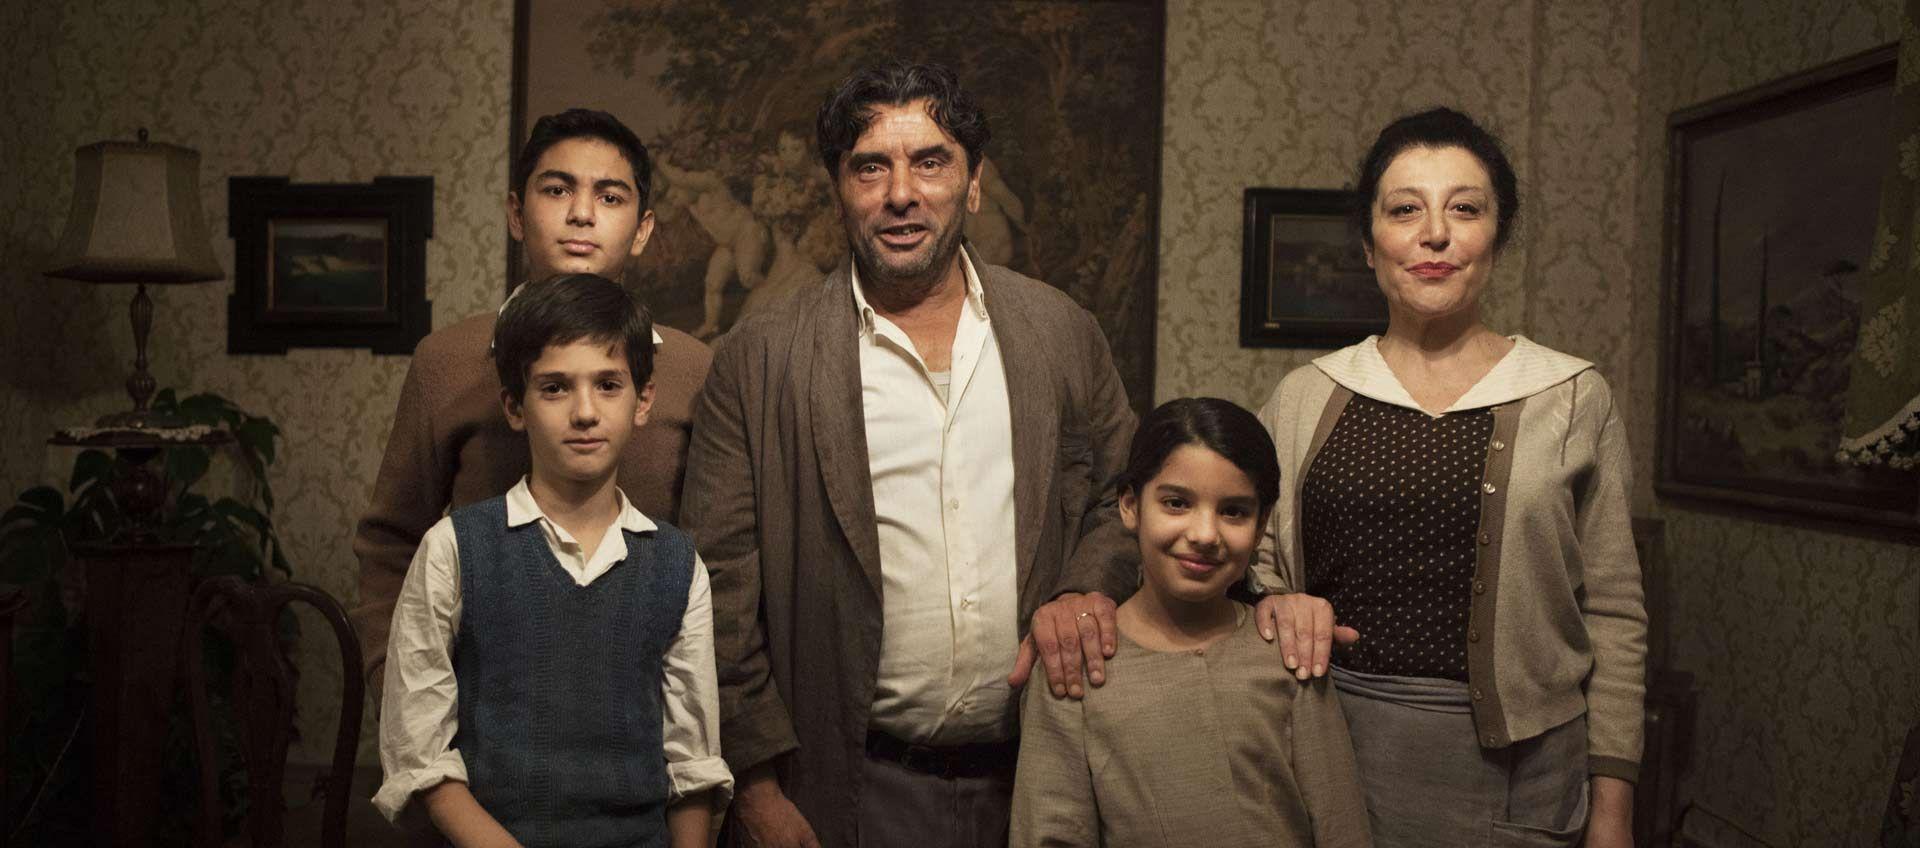 Famille Carracci